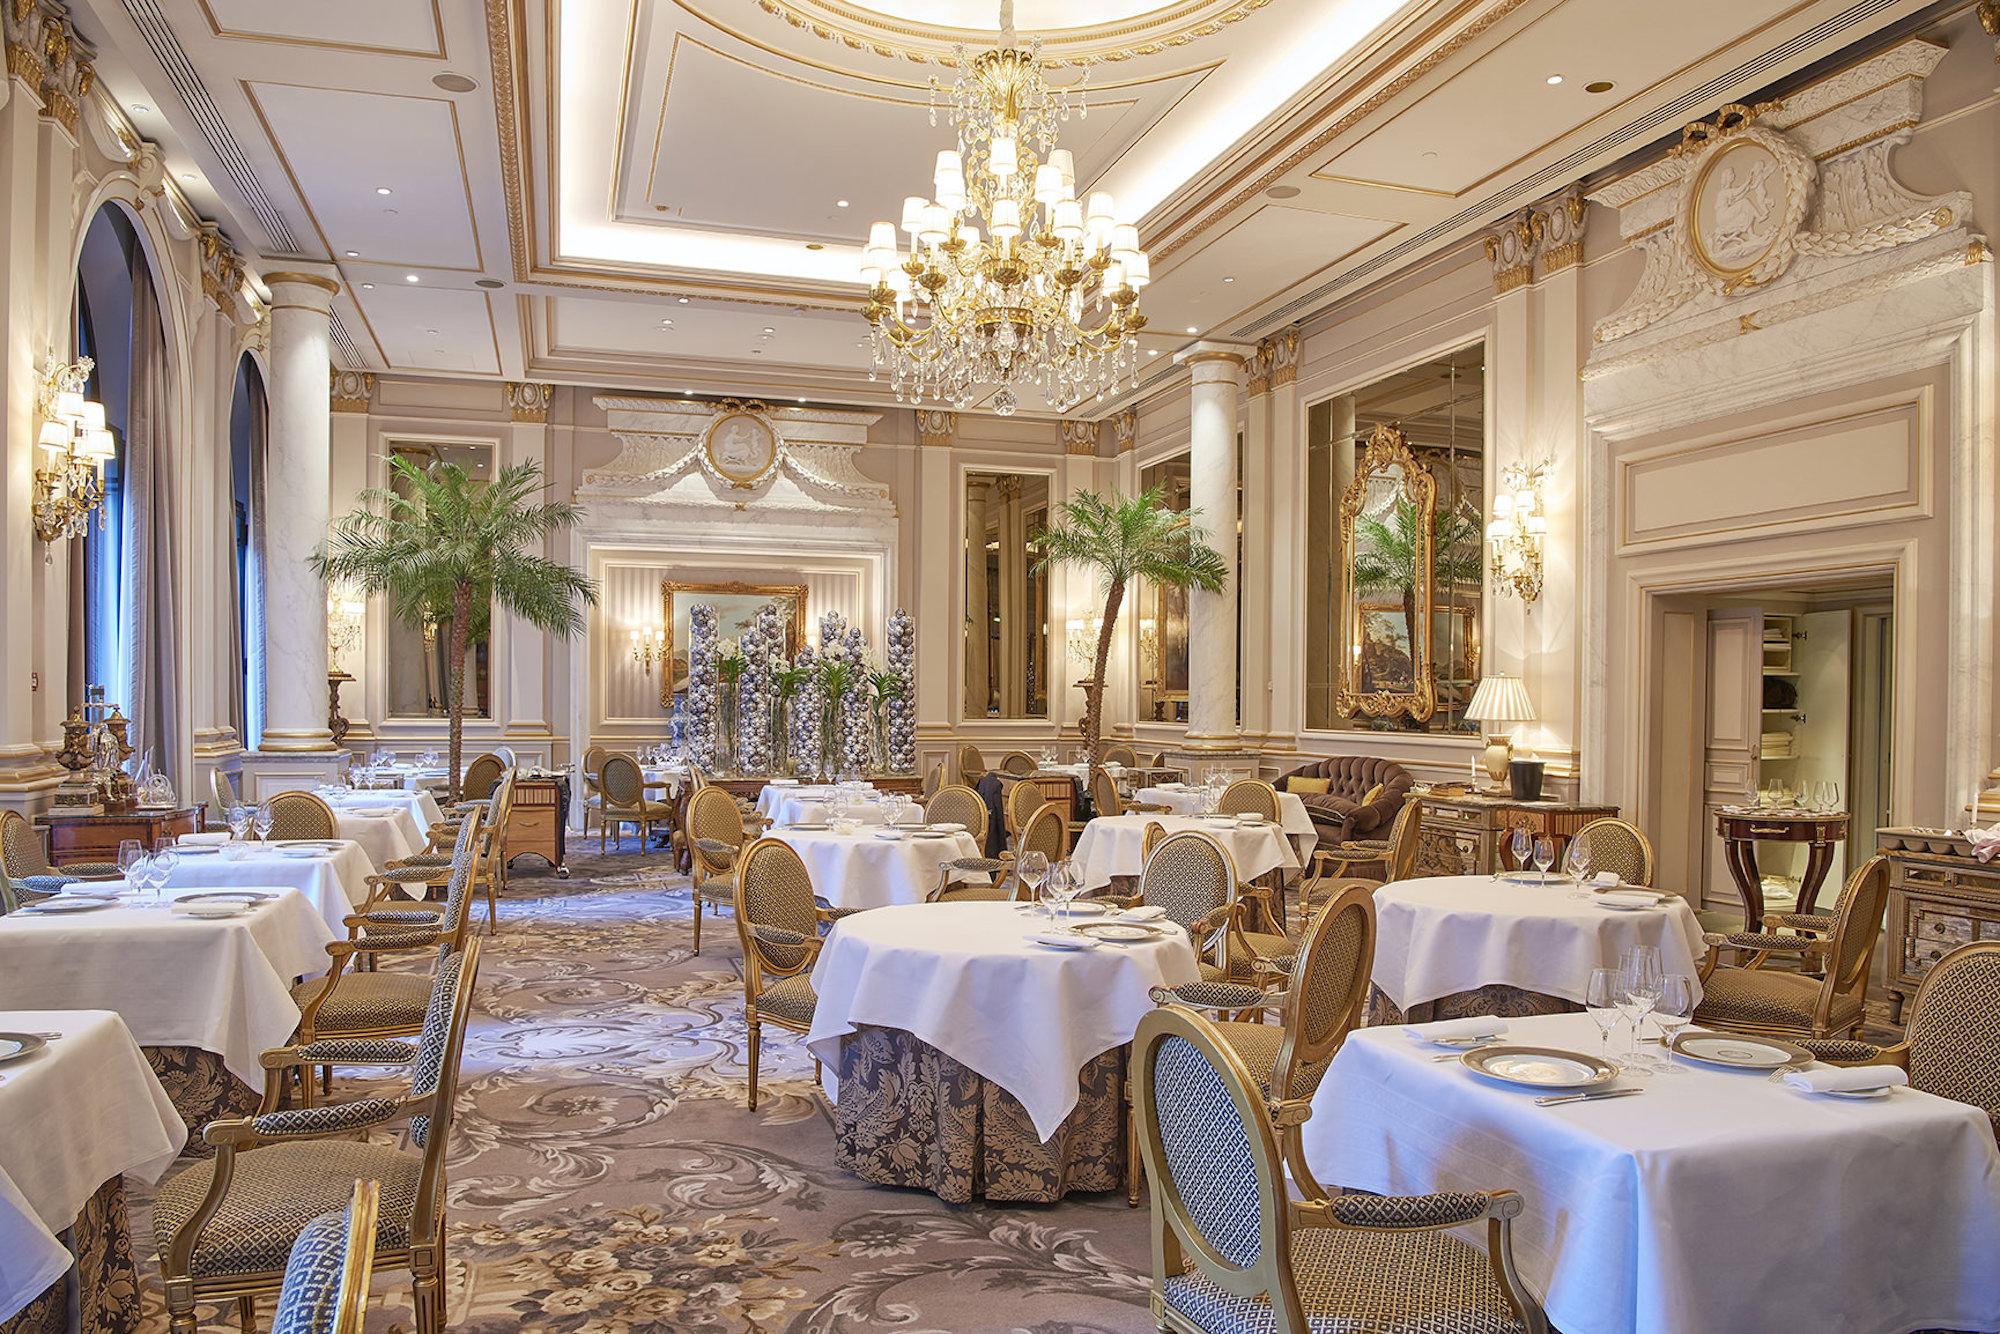 Christian Le Squer Restaurant Le Cinq(レストラン ルサンク)内観